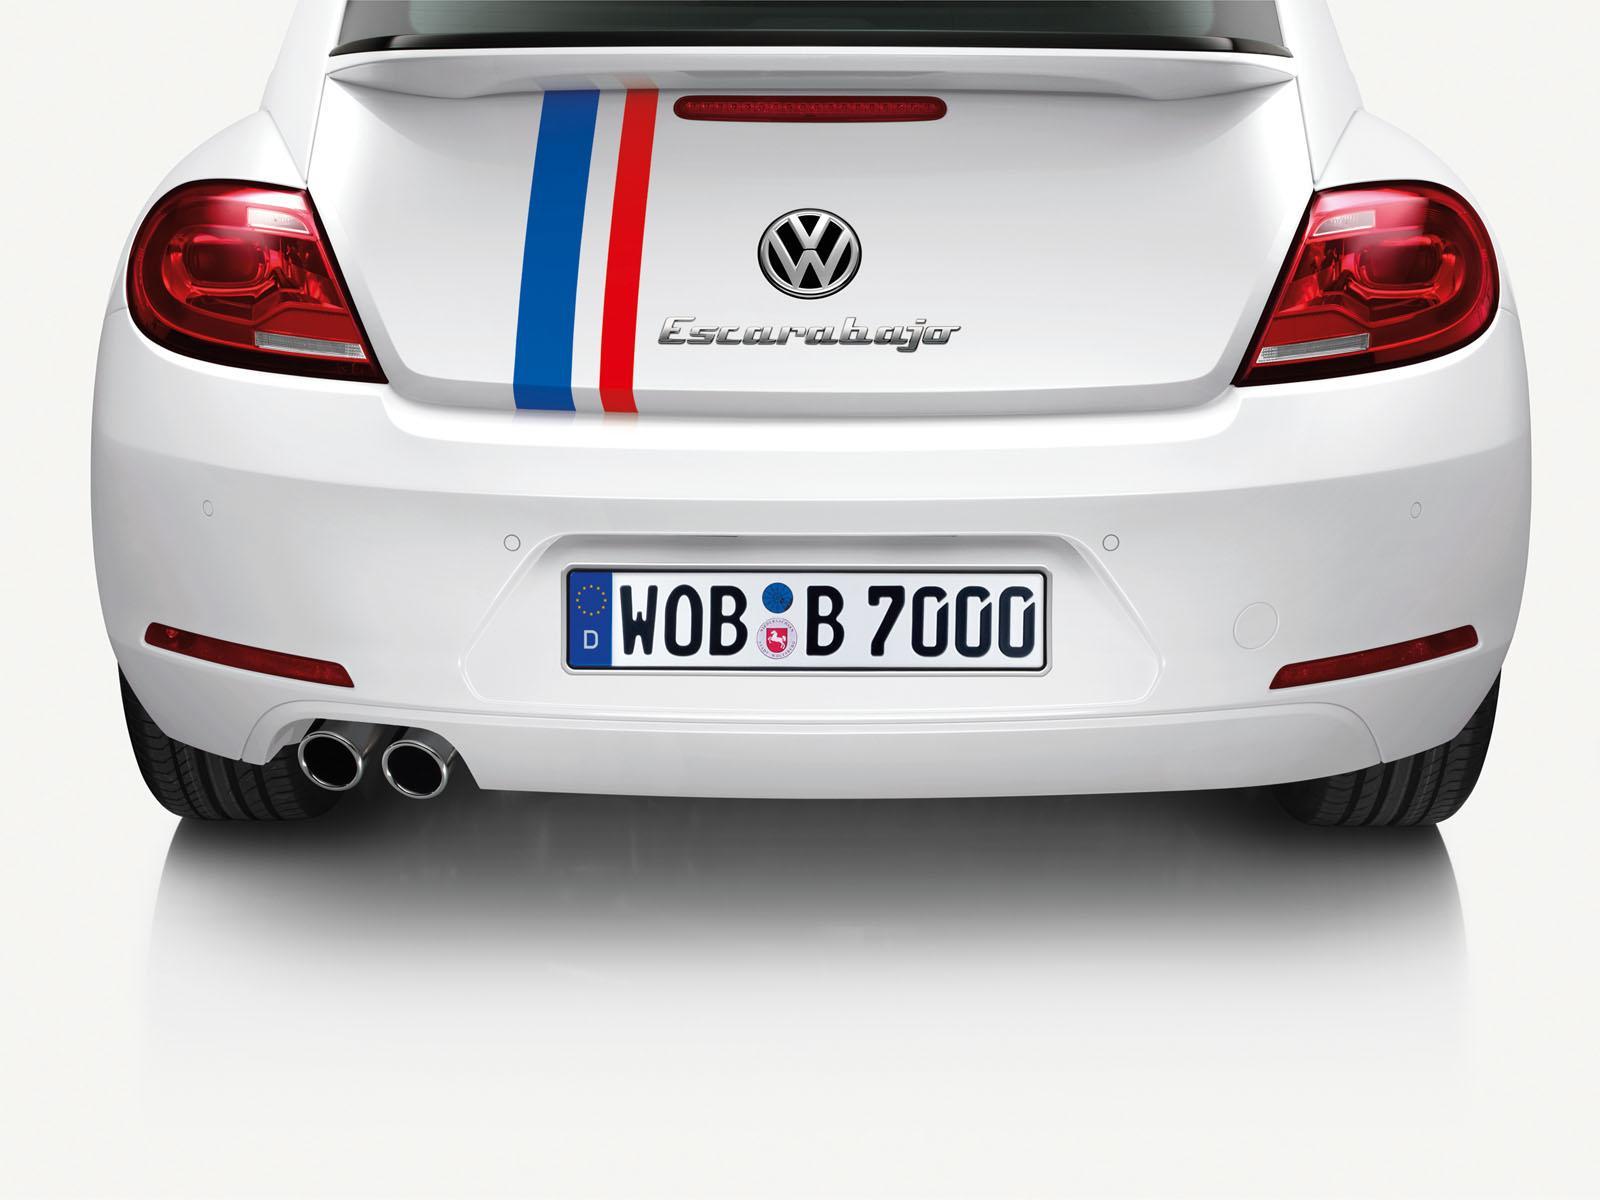 Volkswagen Beetle 53 Edition Inspired by Herbie - autoevolution